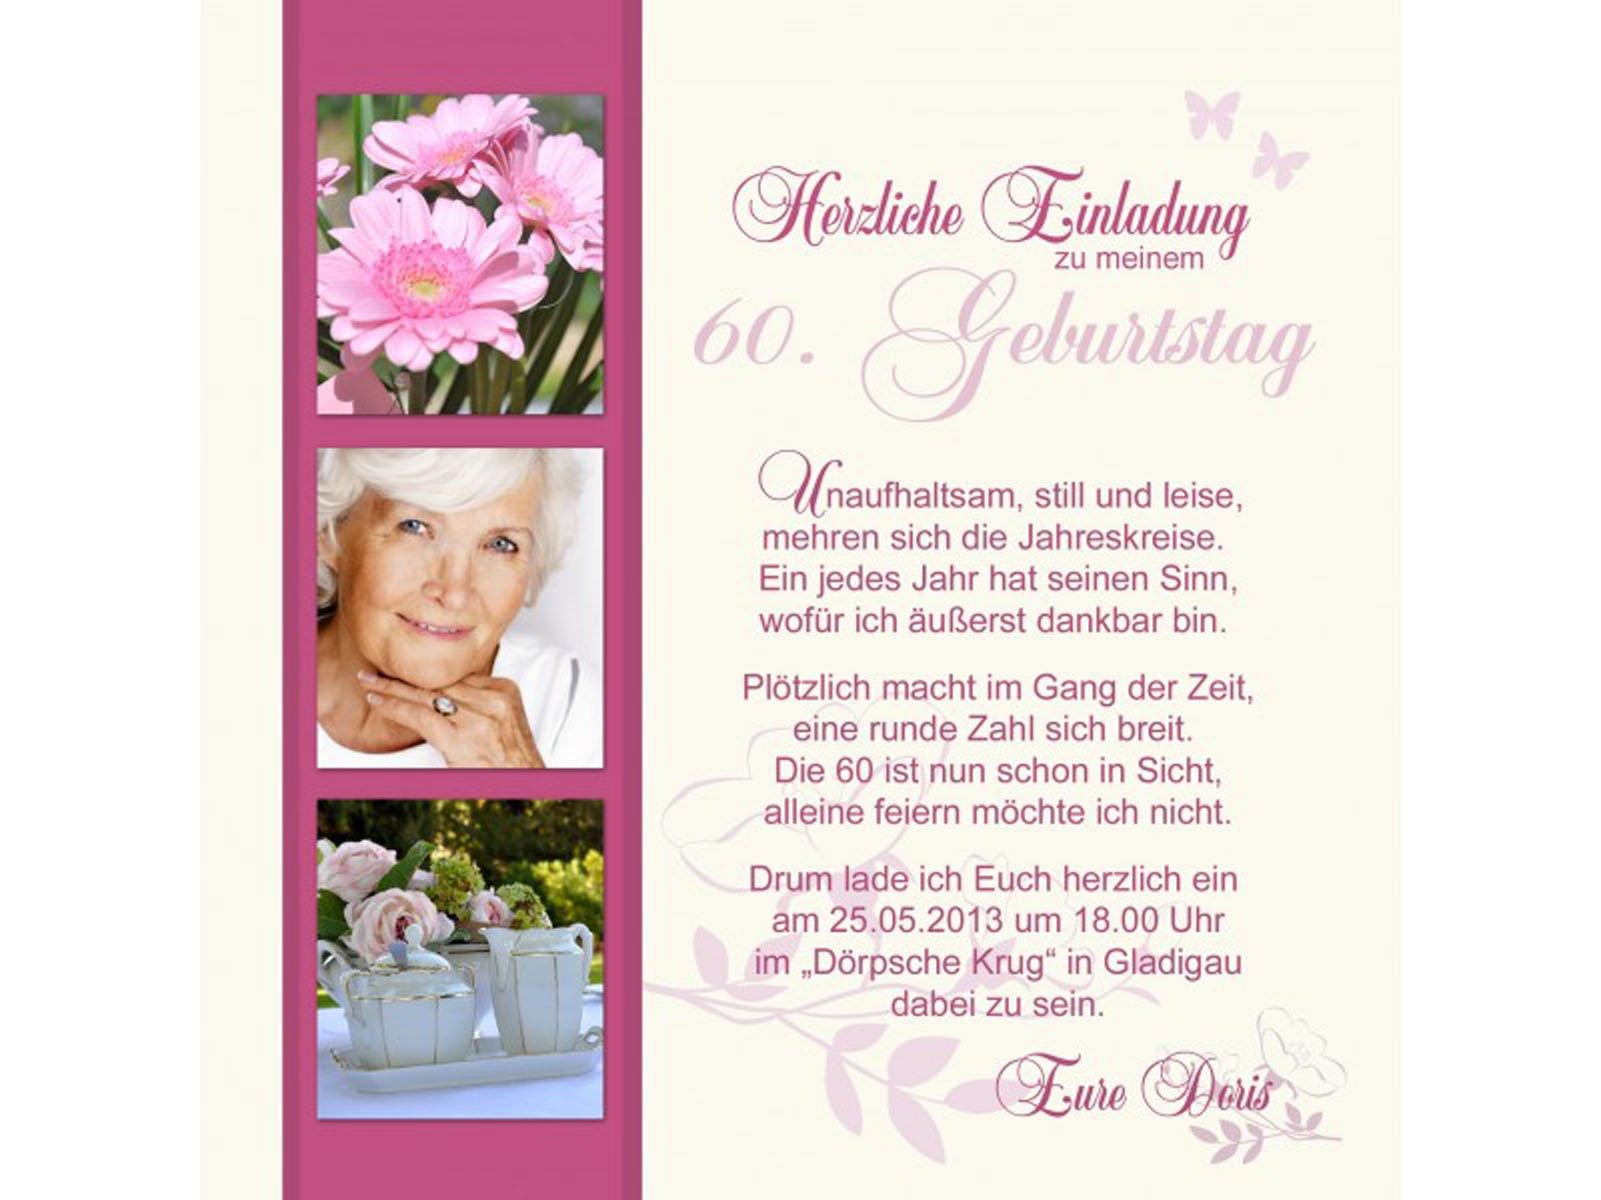 Einladung Zum 60 Geburtstag : Einladung Zum 60. Geburtstag ...